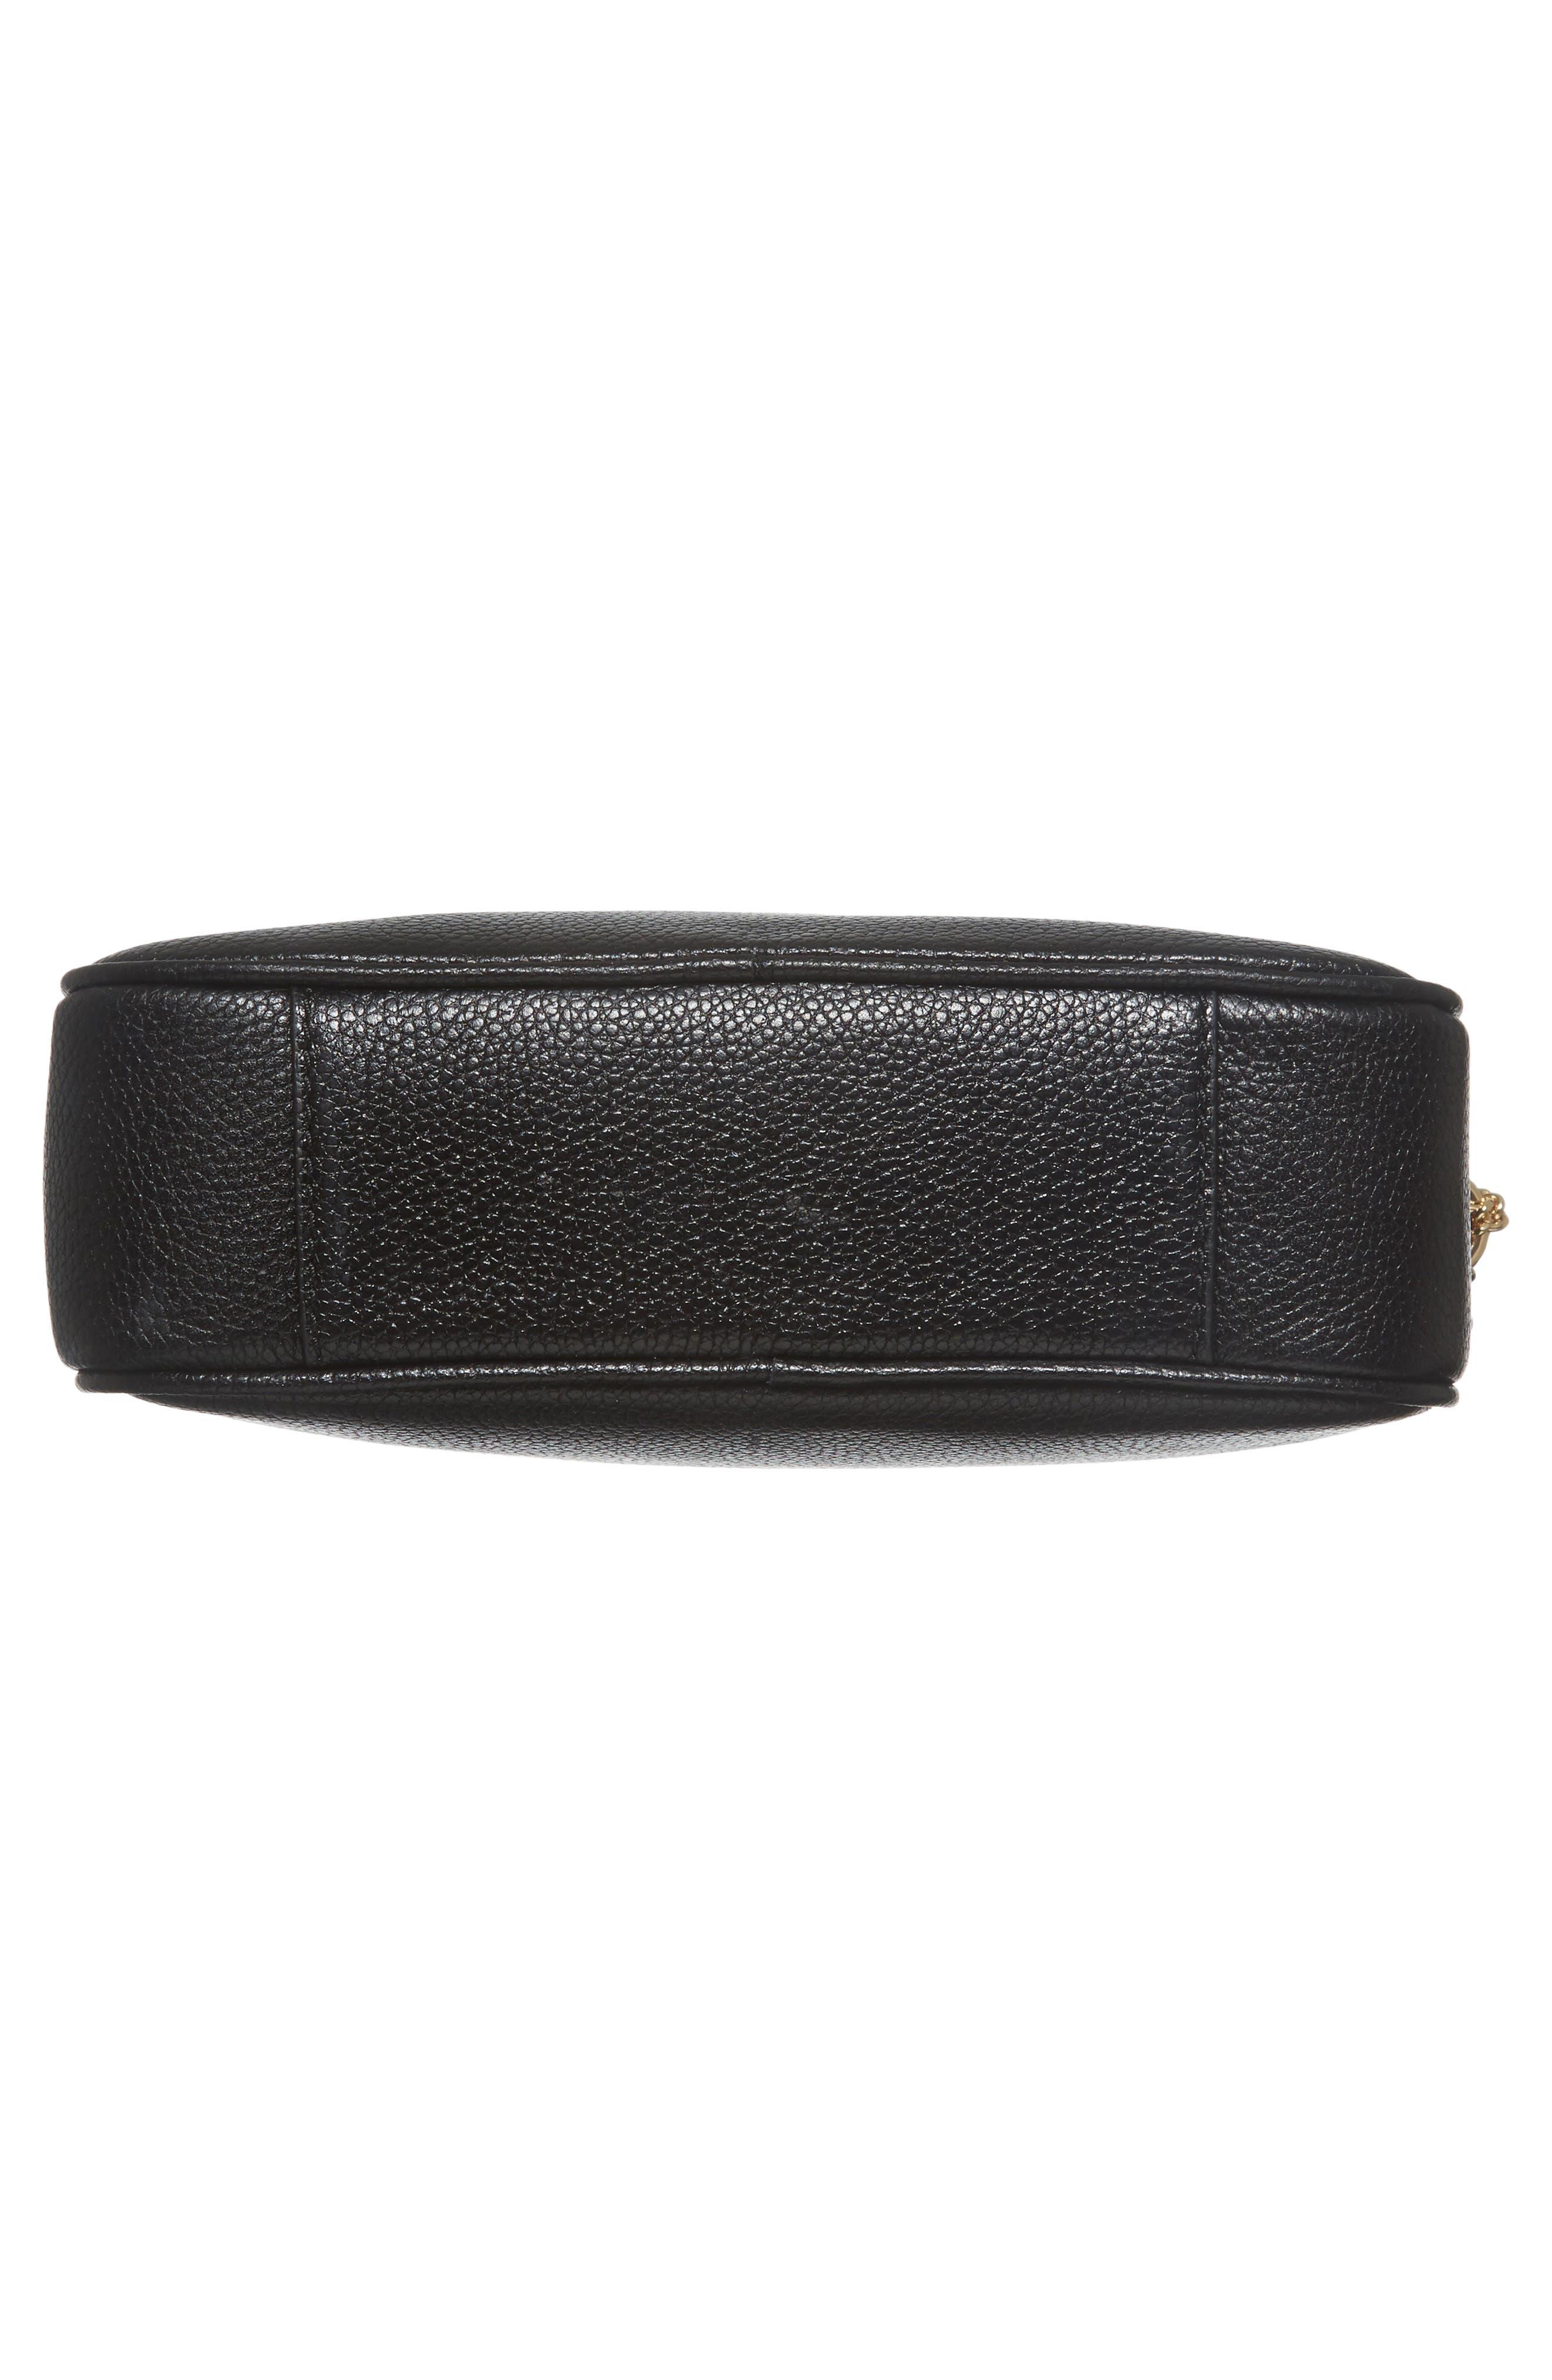 MICHAEL Michael Kors Medium Ginny Leather Camera Bag,                             Alternate thumbnail 6, color,                             001